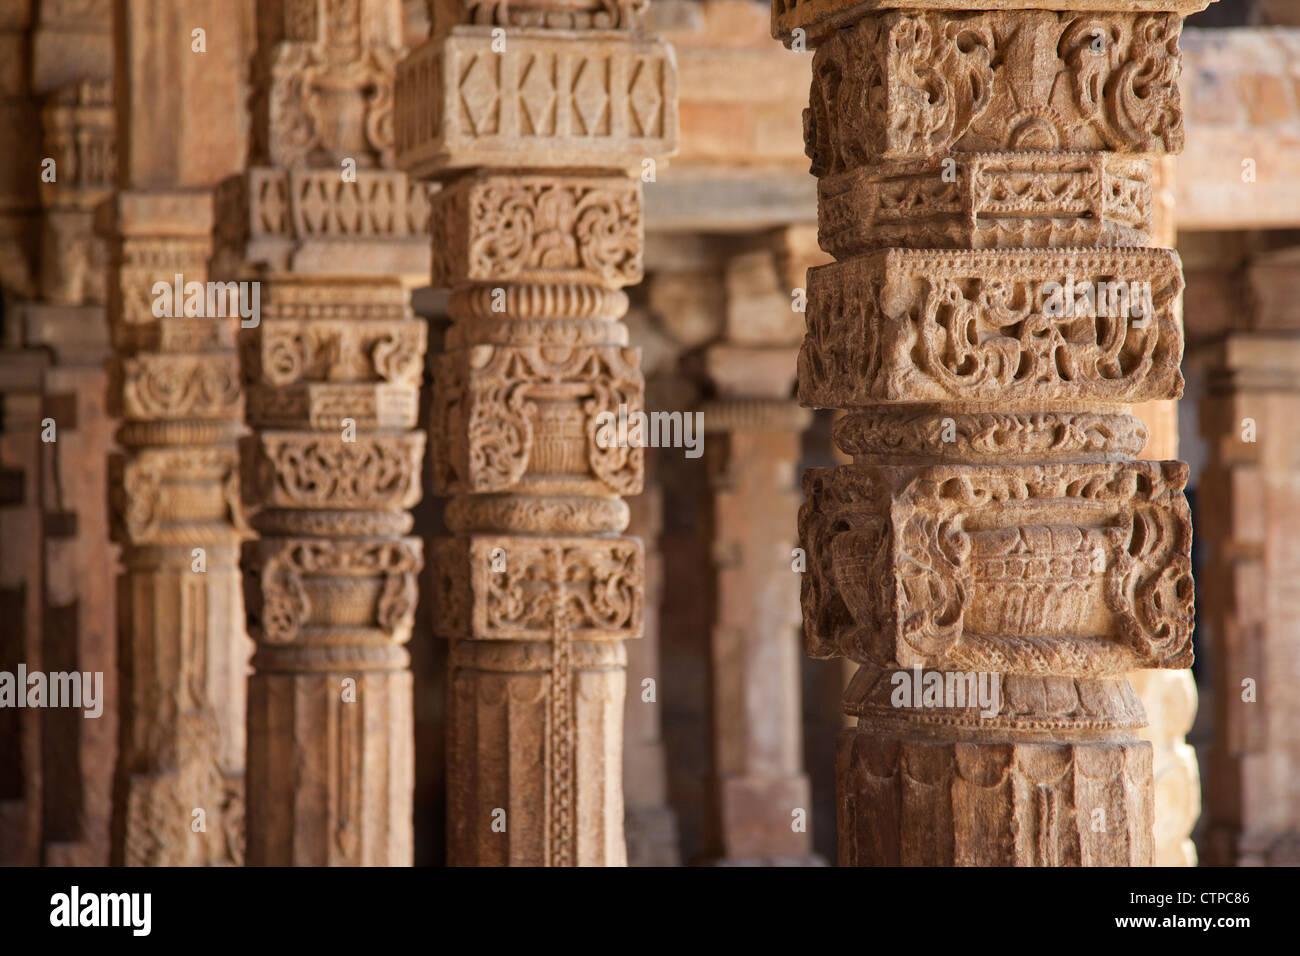 Detail of the Qutub Minar / Qutb Minar, UNESCO World Heritage Site and tallest minaret in Delhi, India - Stock Image